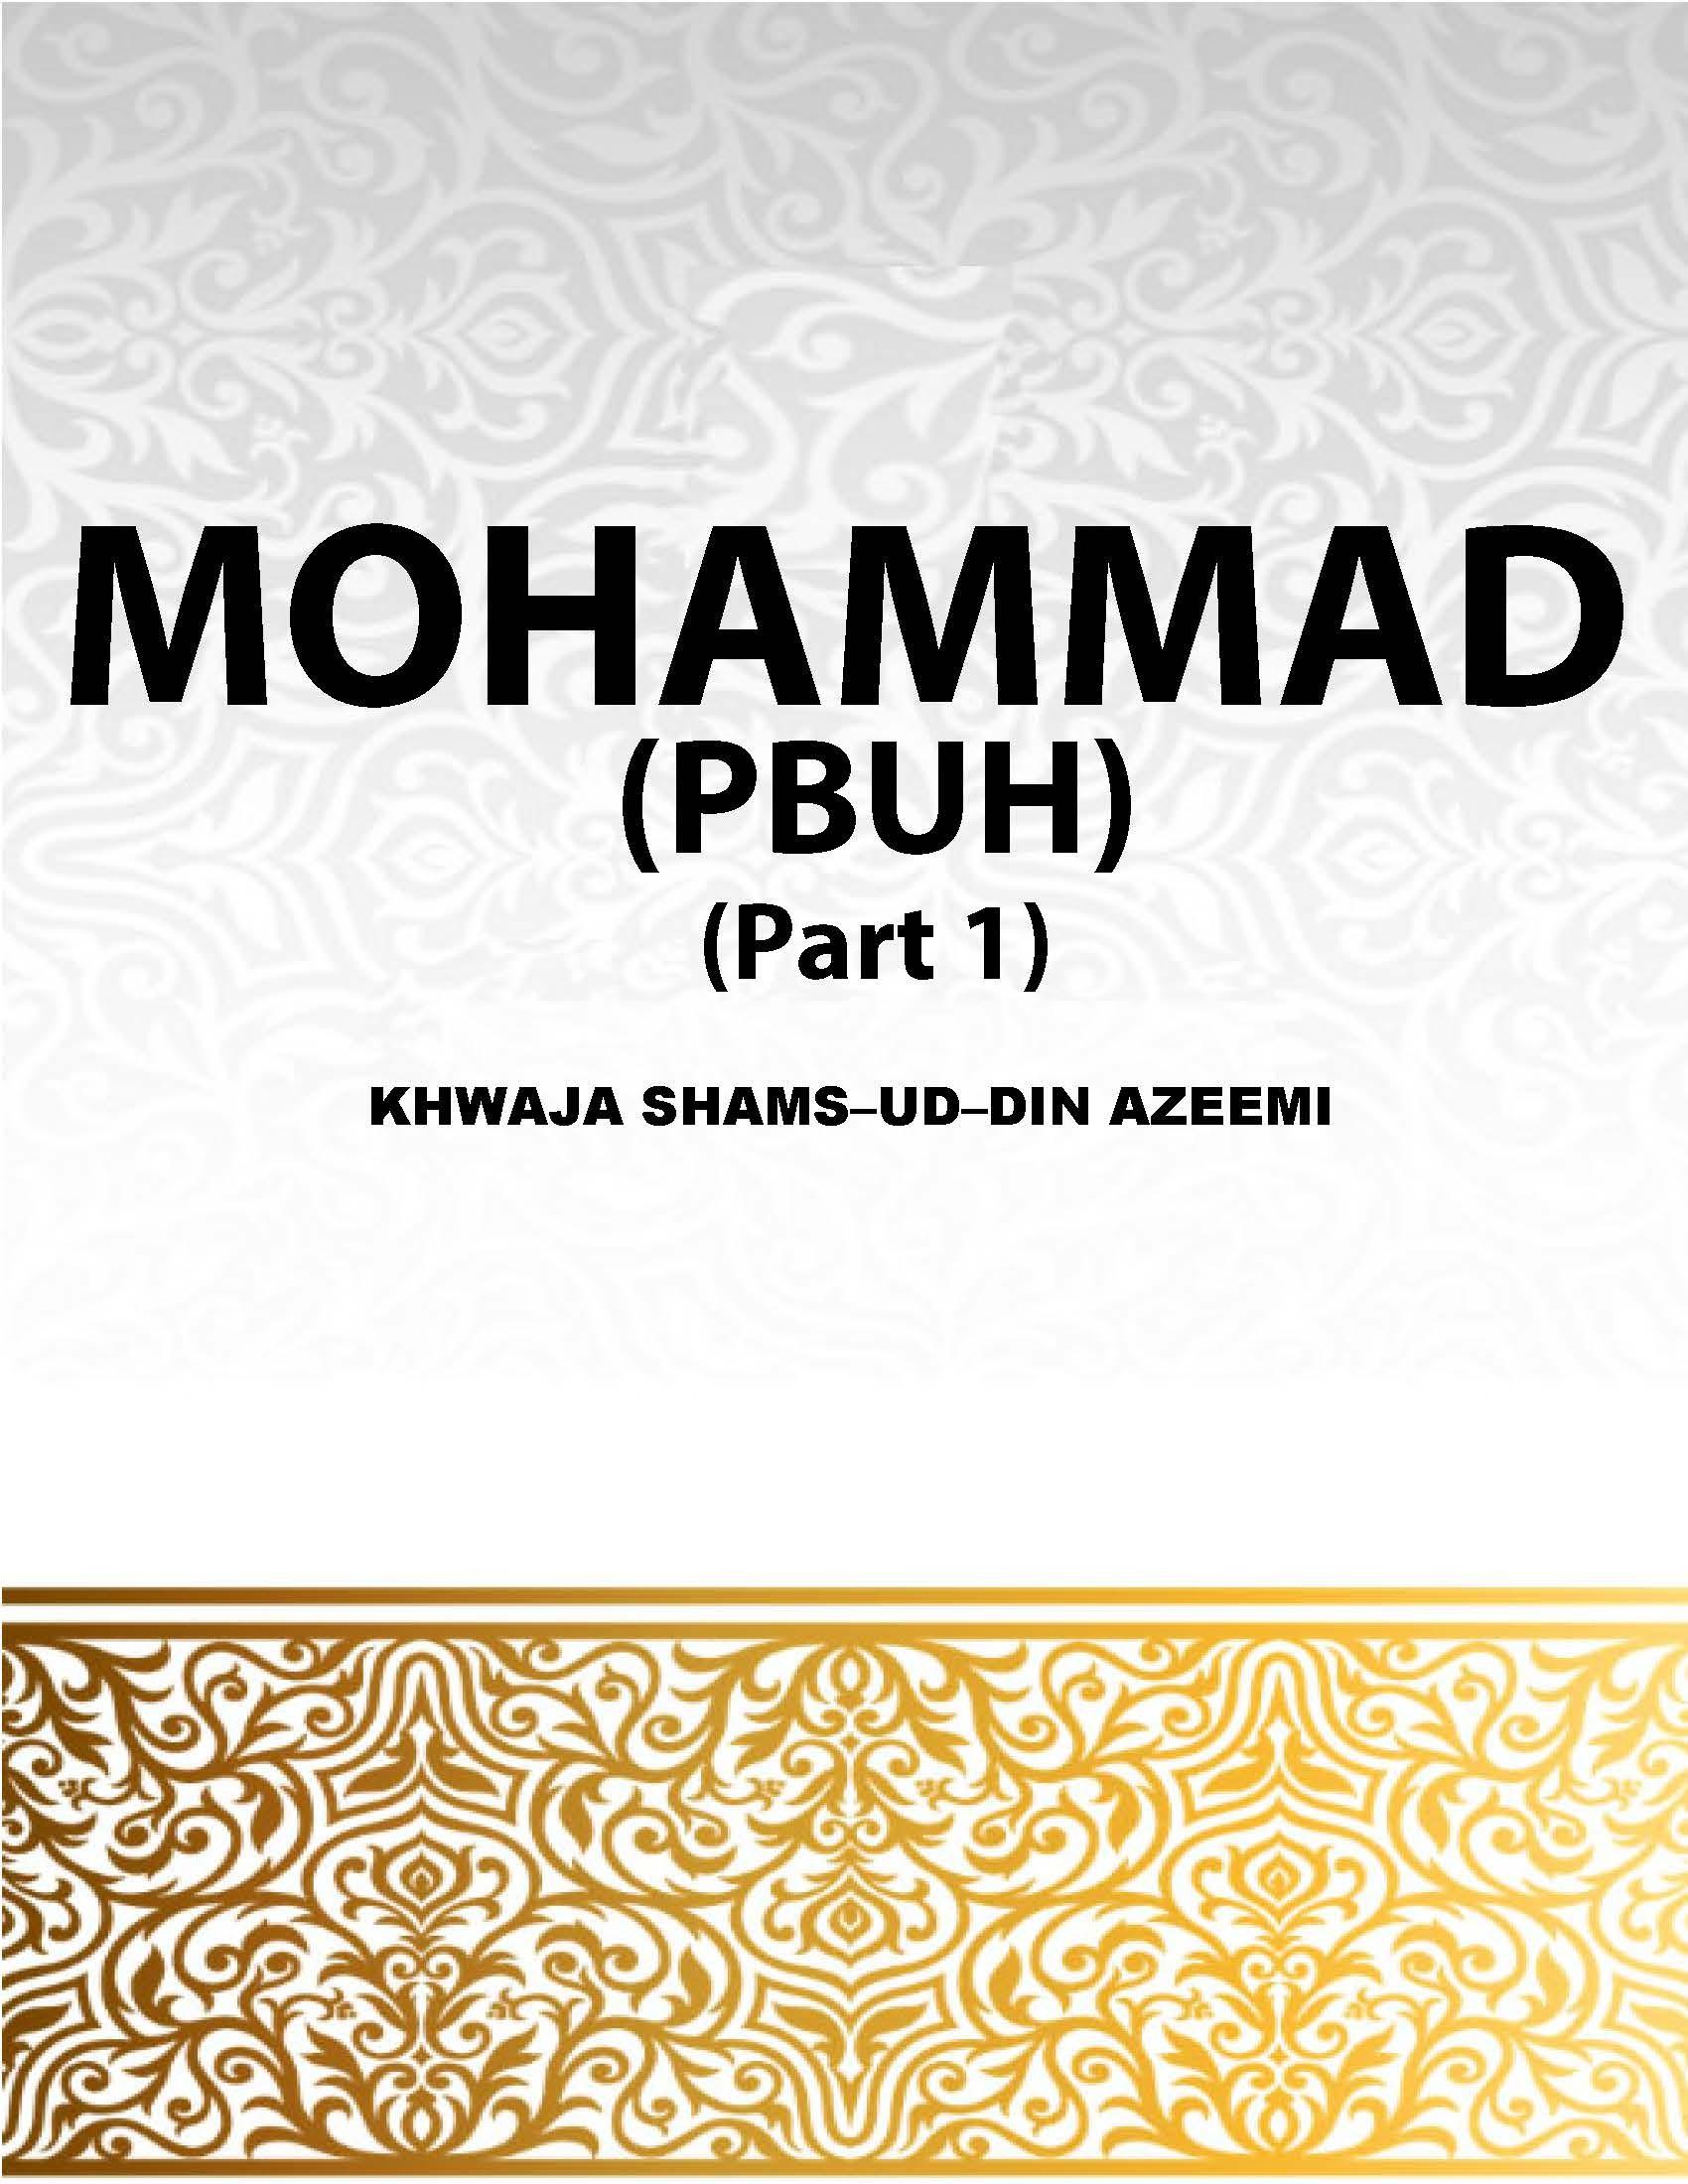 MOHAMMAD (PBUH)  The Prophet Of God -  Part I